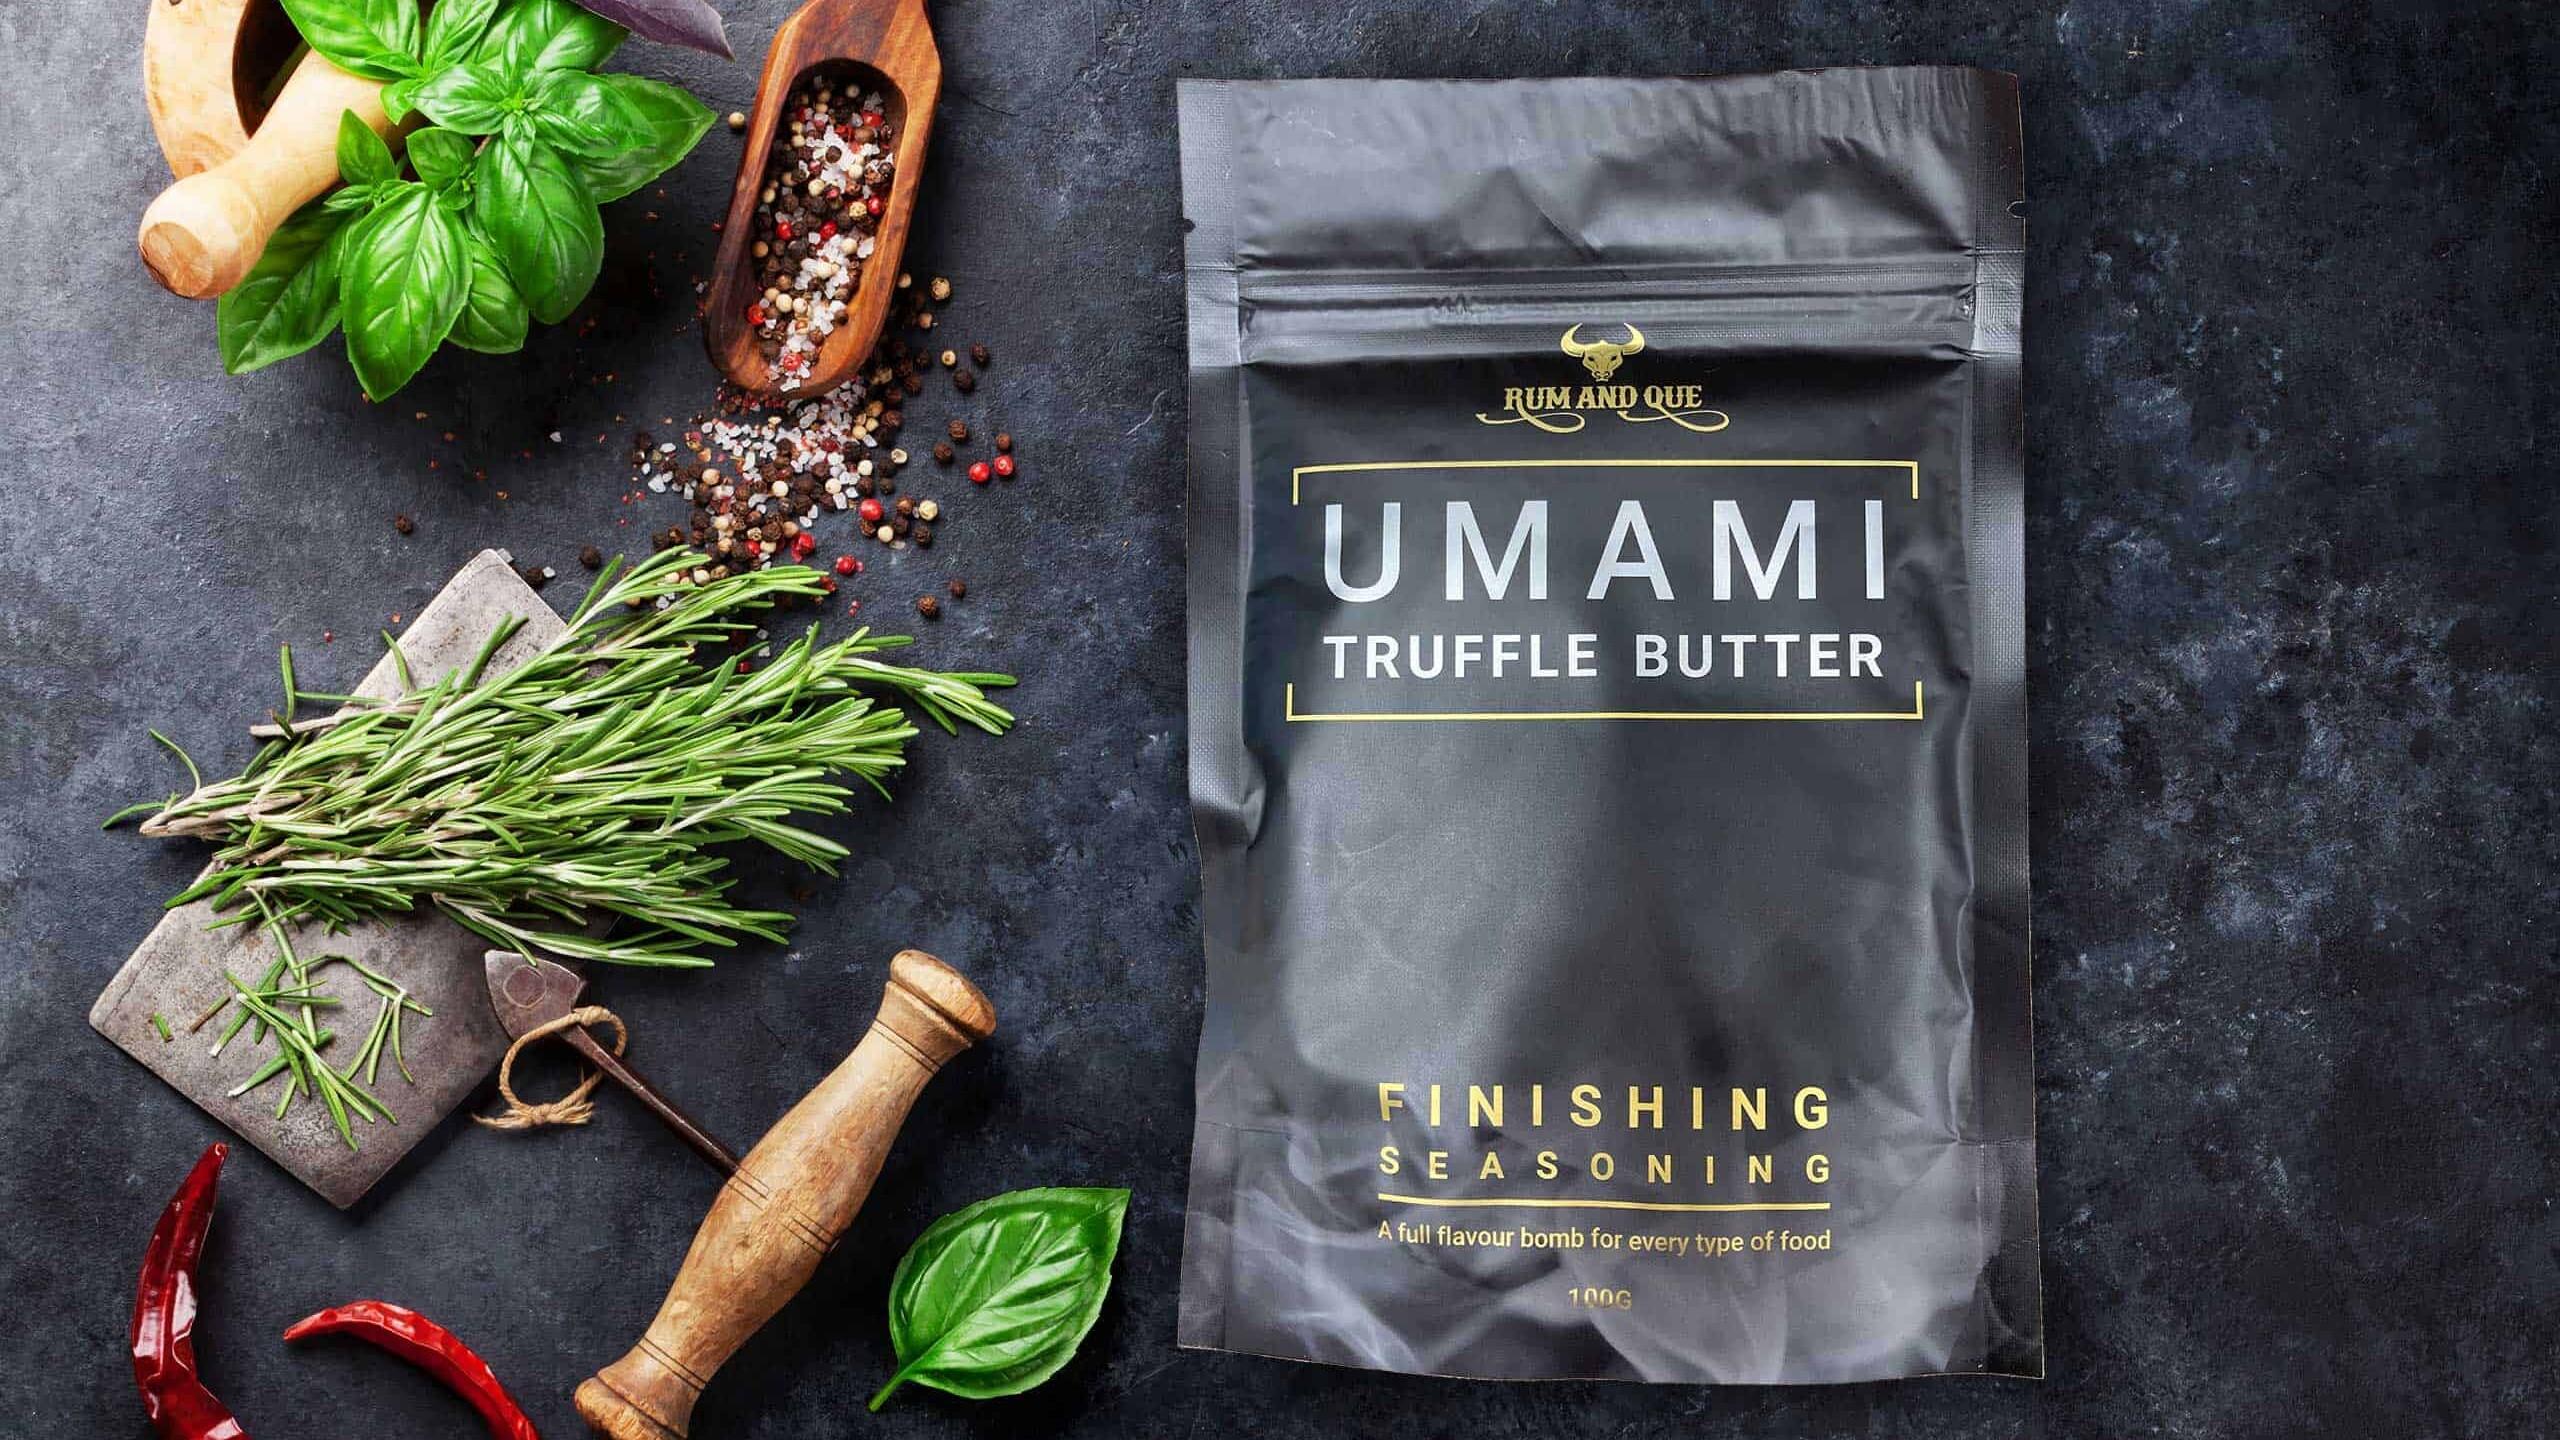 Rum & Que Umami Truffle Butter Finishing Seasoning